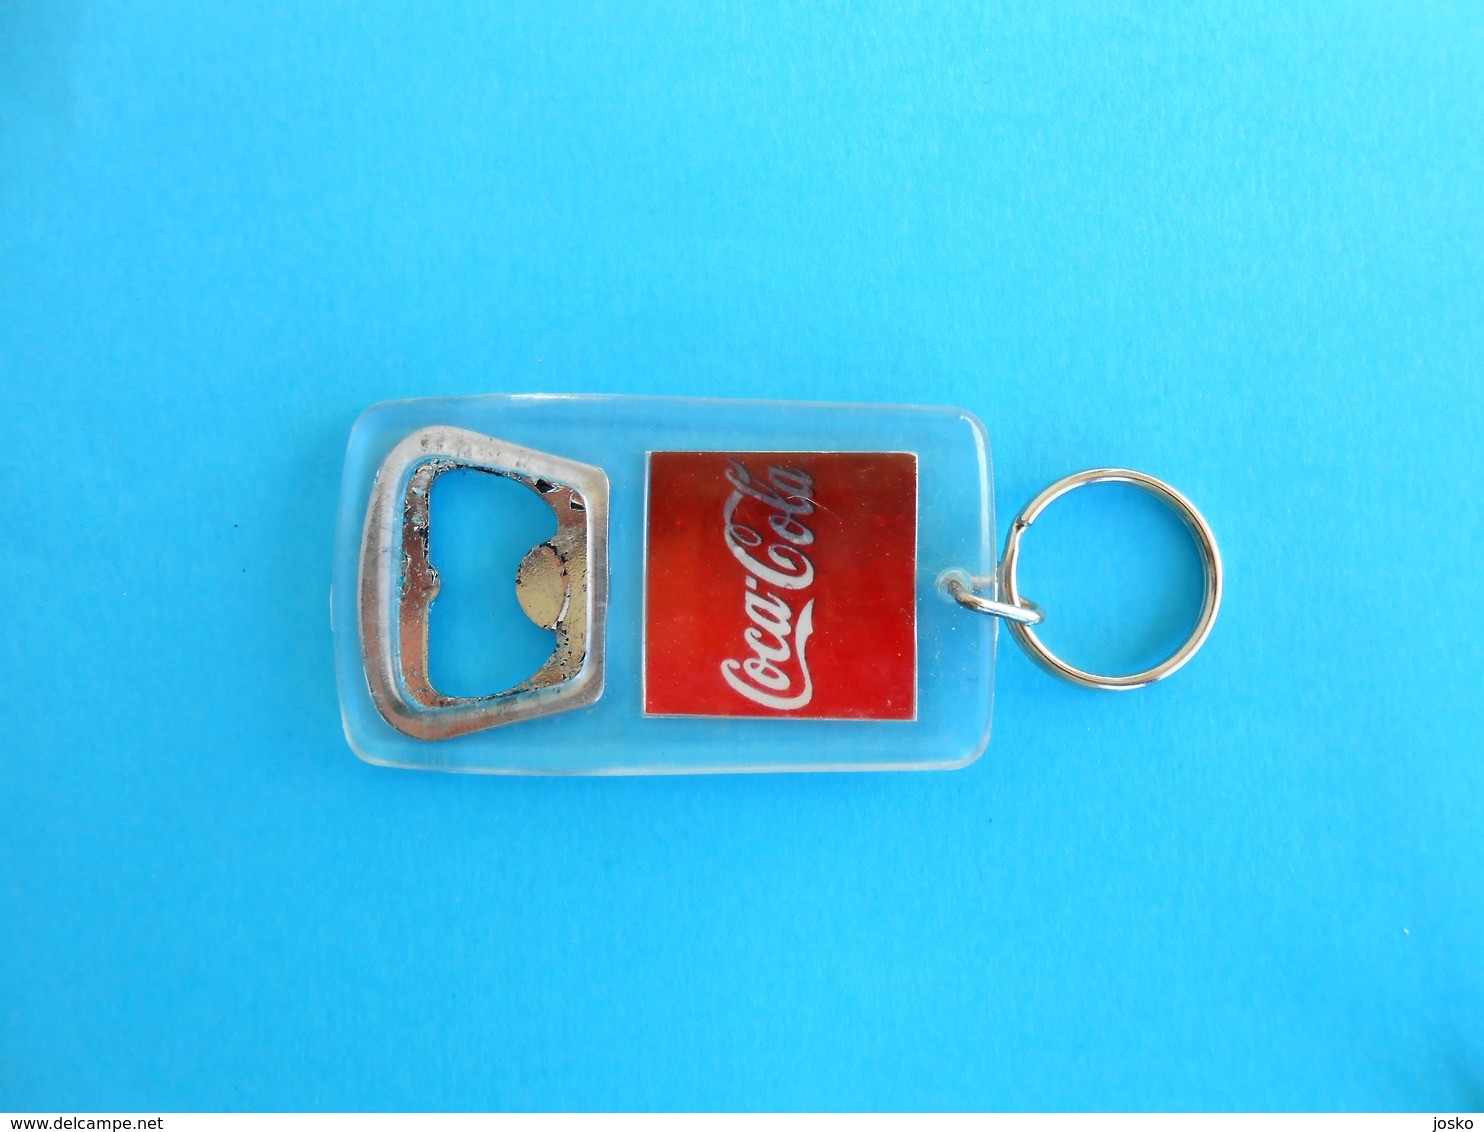 COCA-COLA ... Bottle Opener - Keychain - Ouvre-bouteilles & Tire-bouchons